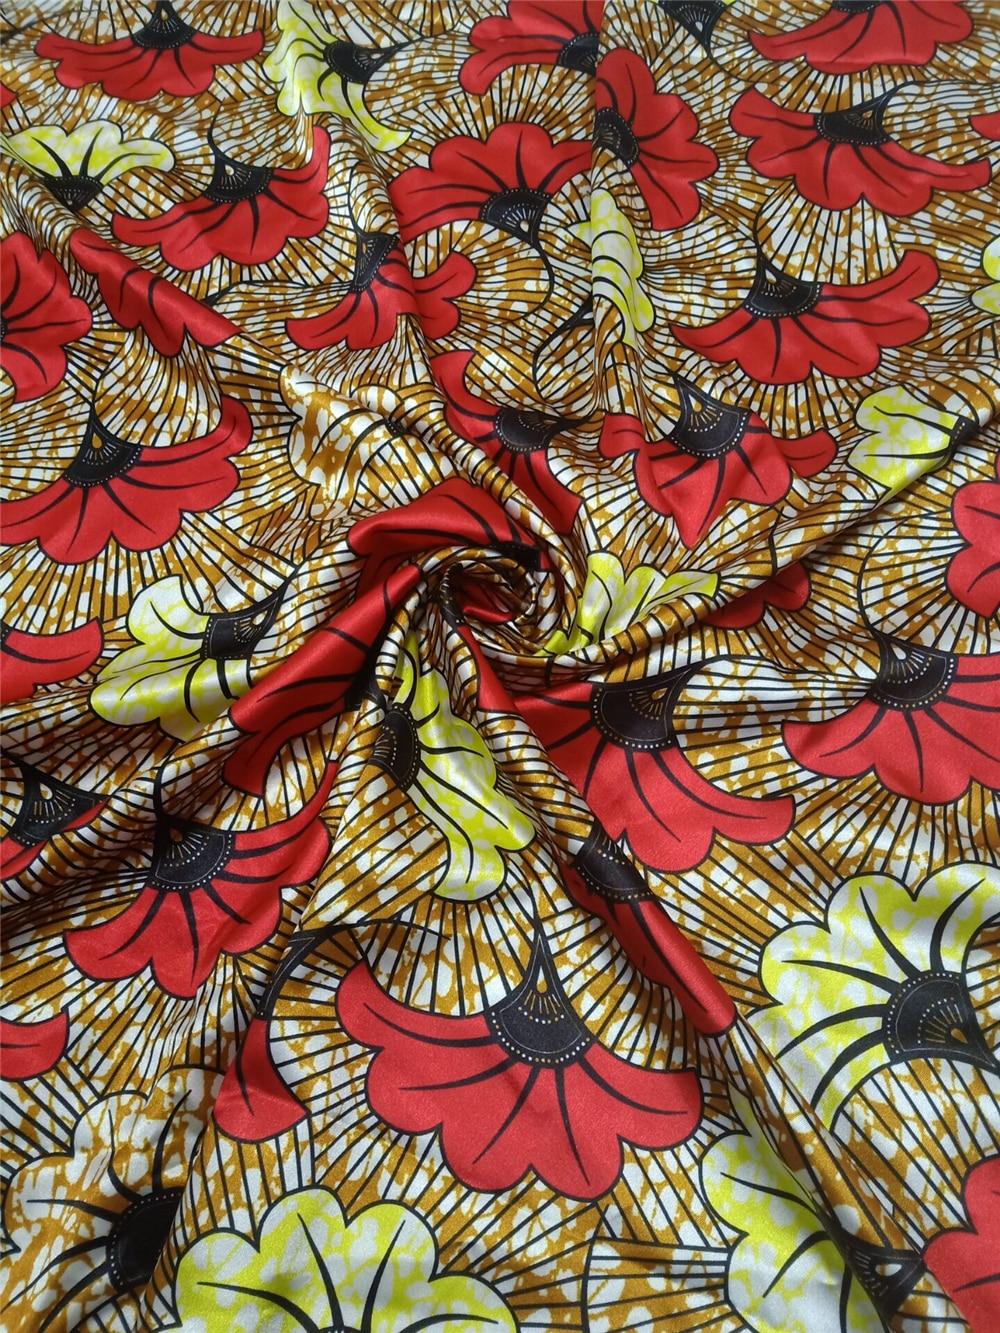 Image 5 - Milylace hot selling african digital printed wax pattern satin fabric fashionable wax pattern design satin fabric SA17049Fabric   -